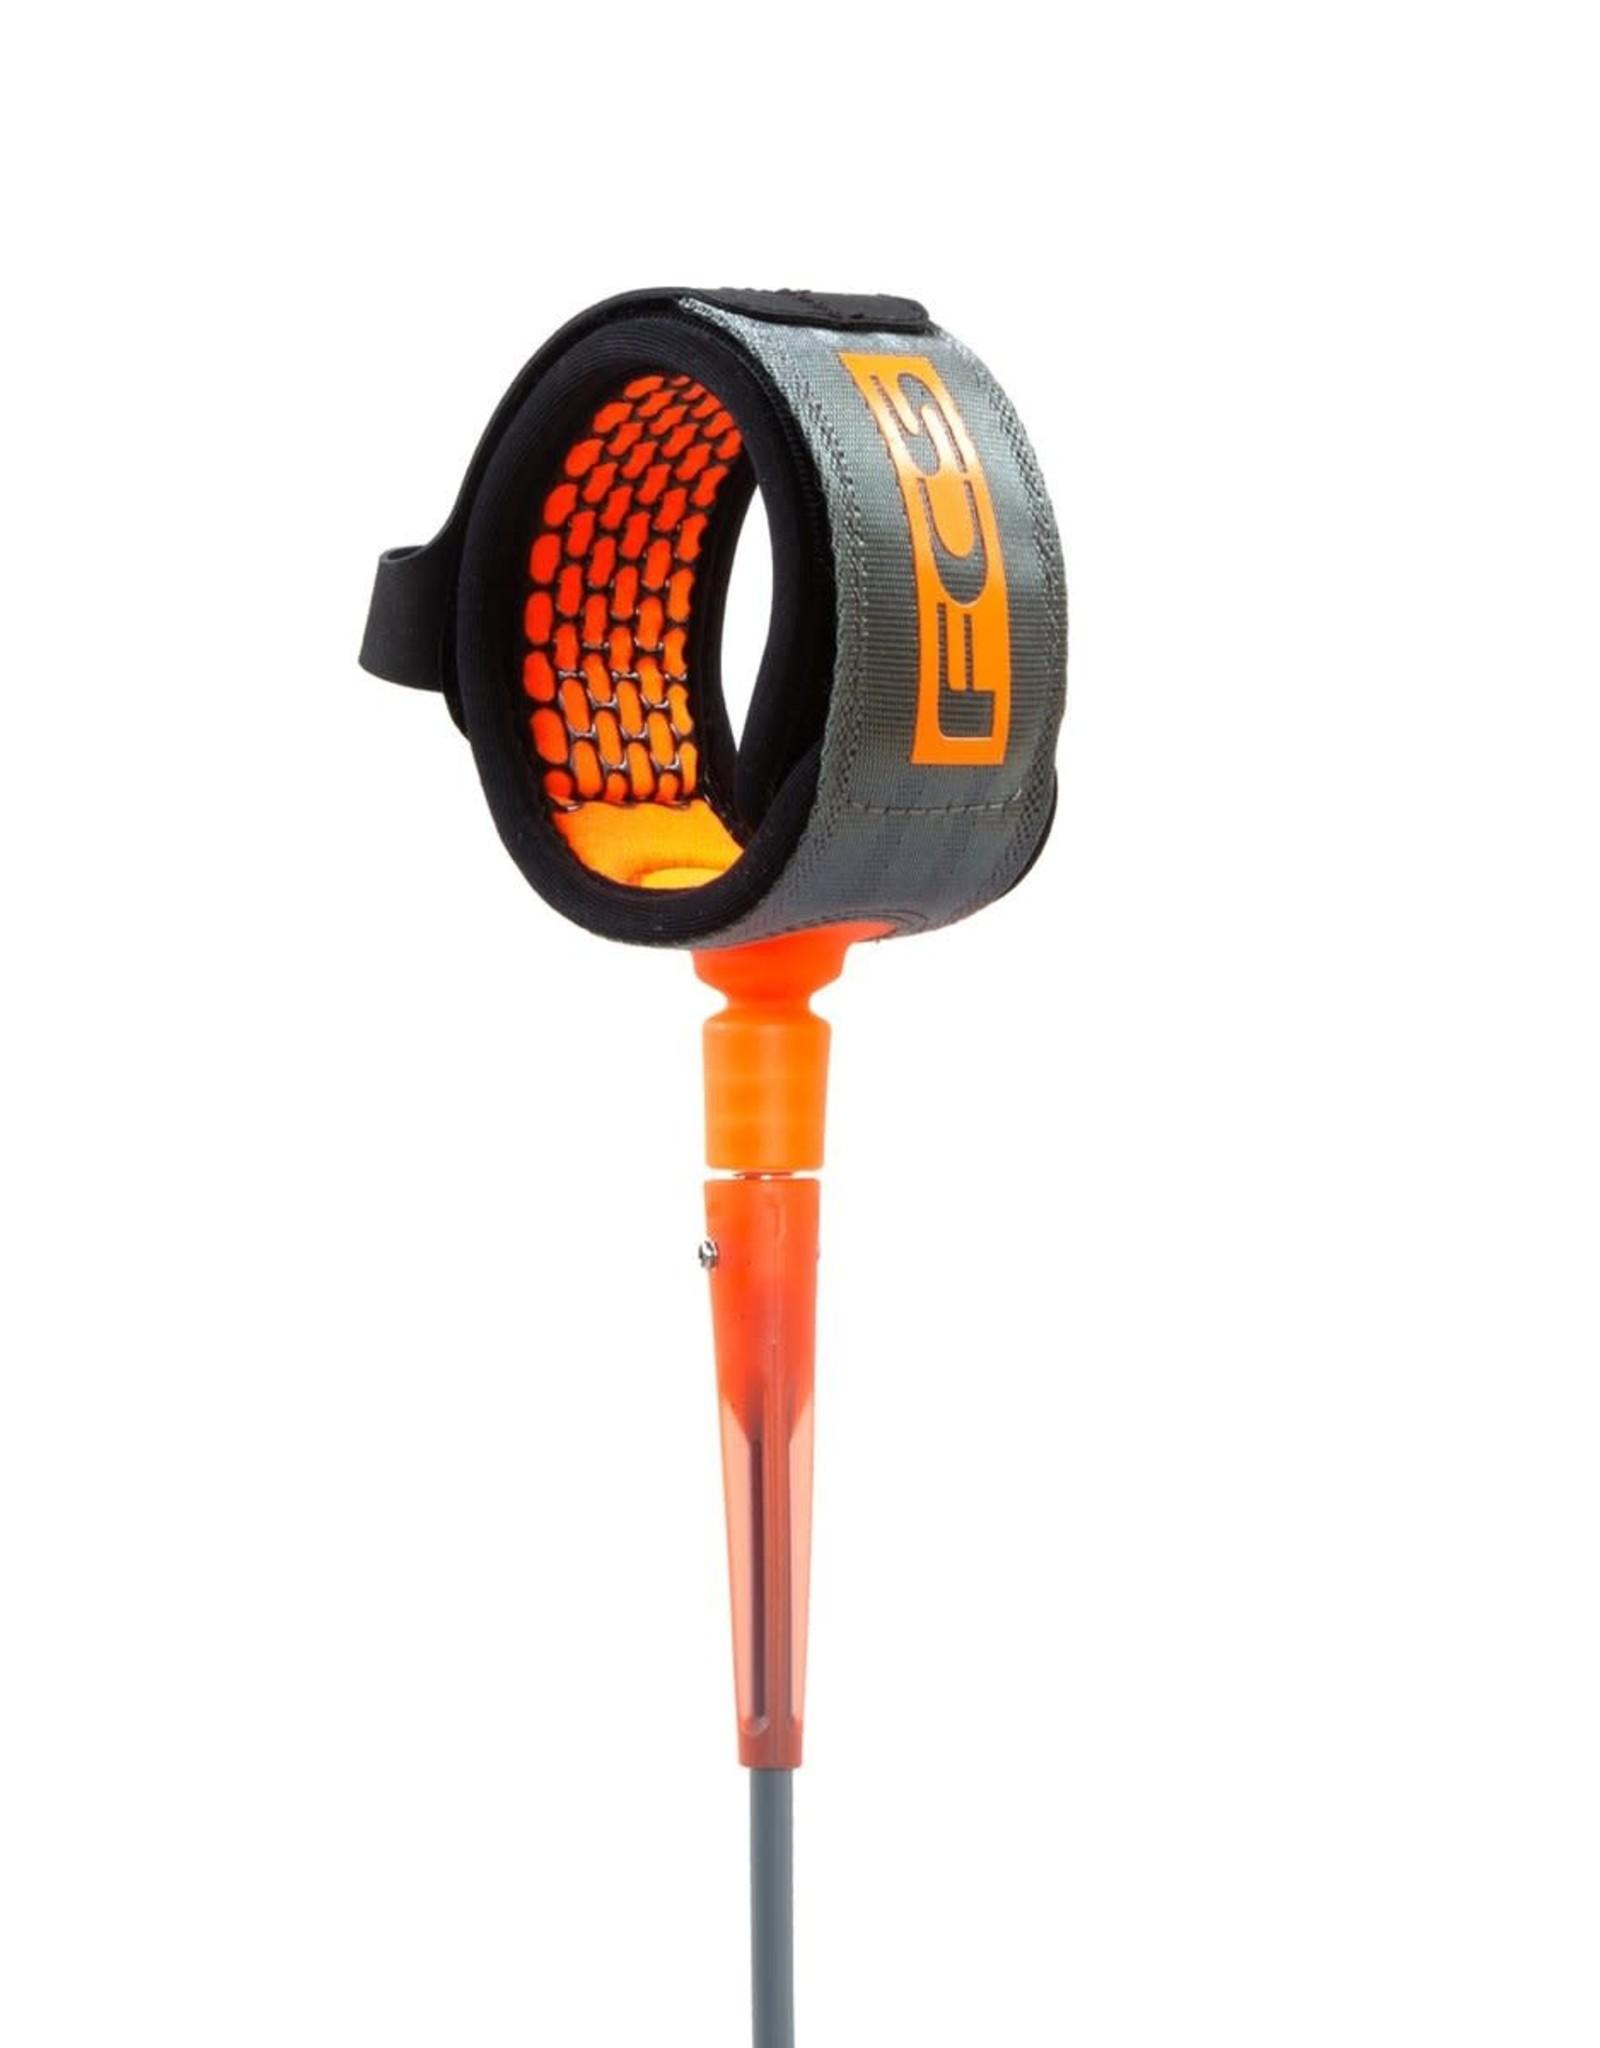 FCS FCS 7' All Round Essential Leash Charcoal/Orange